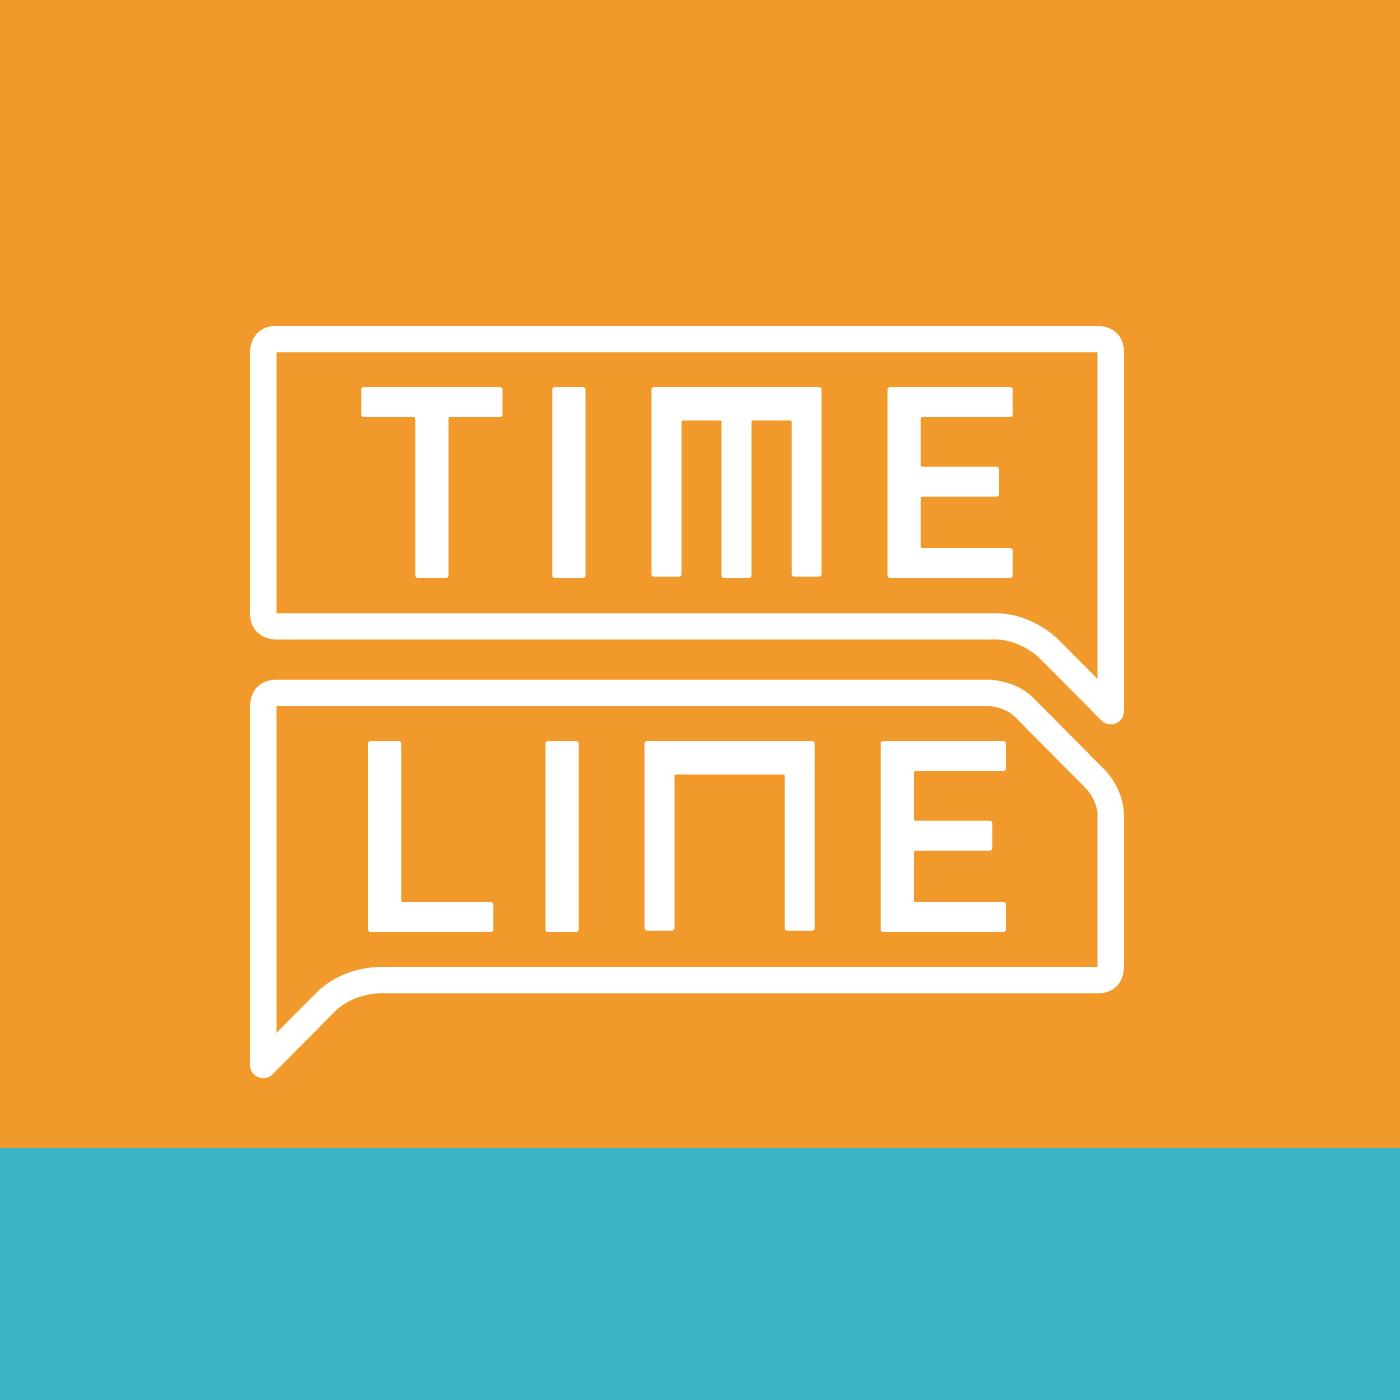 Timeline Ga�cha - 25/10/2016